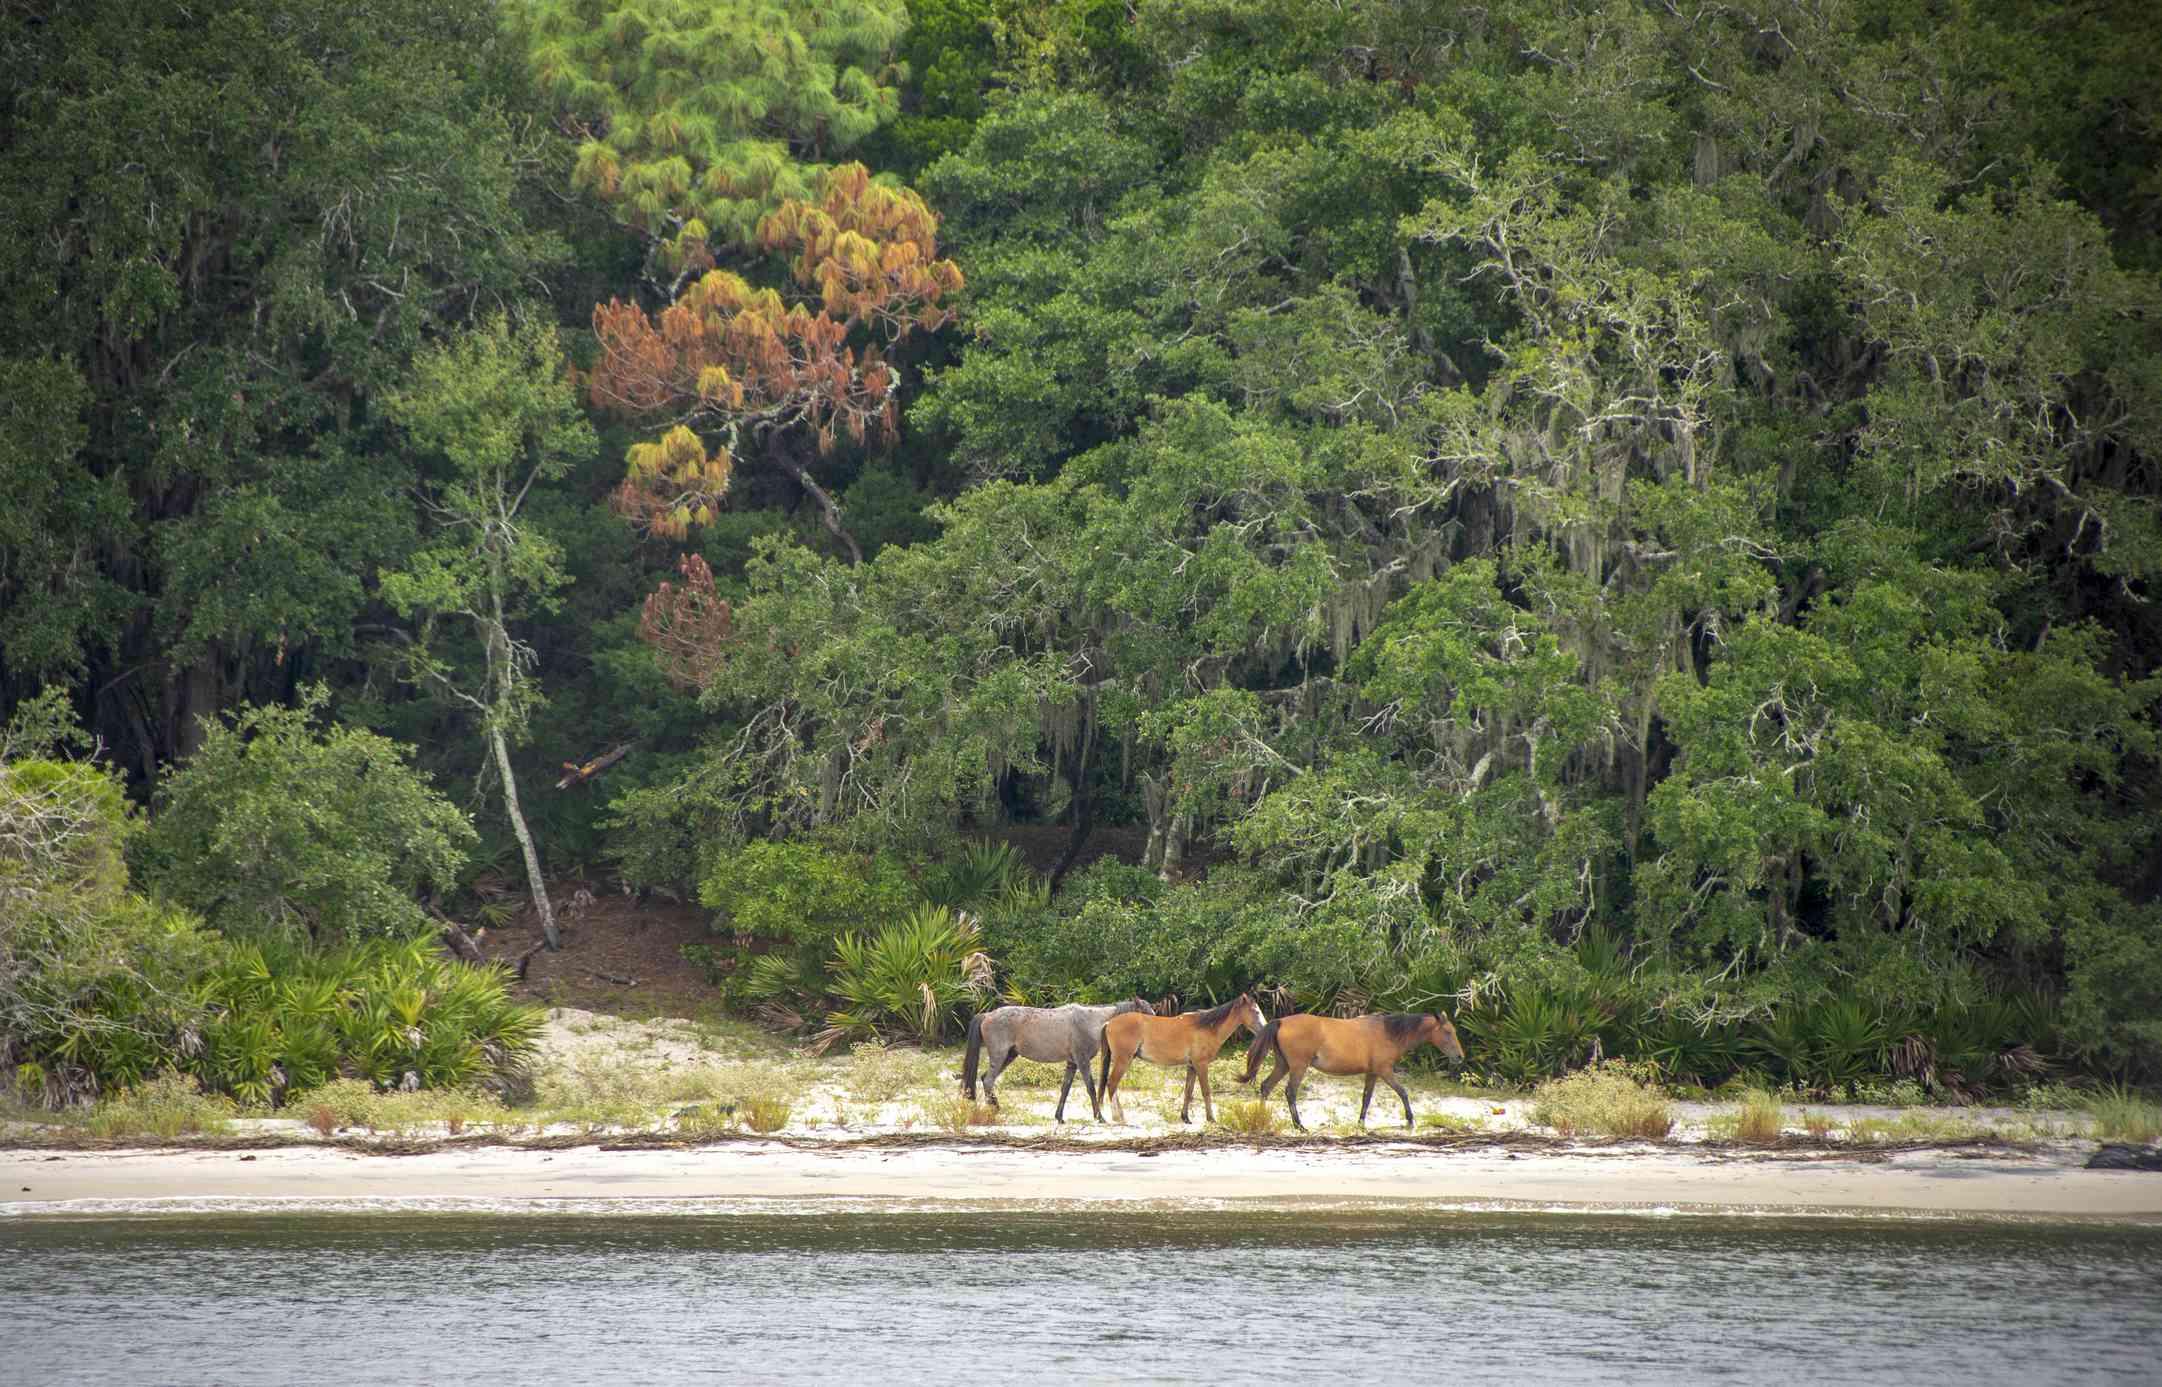 Three feral horses along the seashore with large trees behind them at Cumberland Island National Seashore